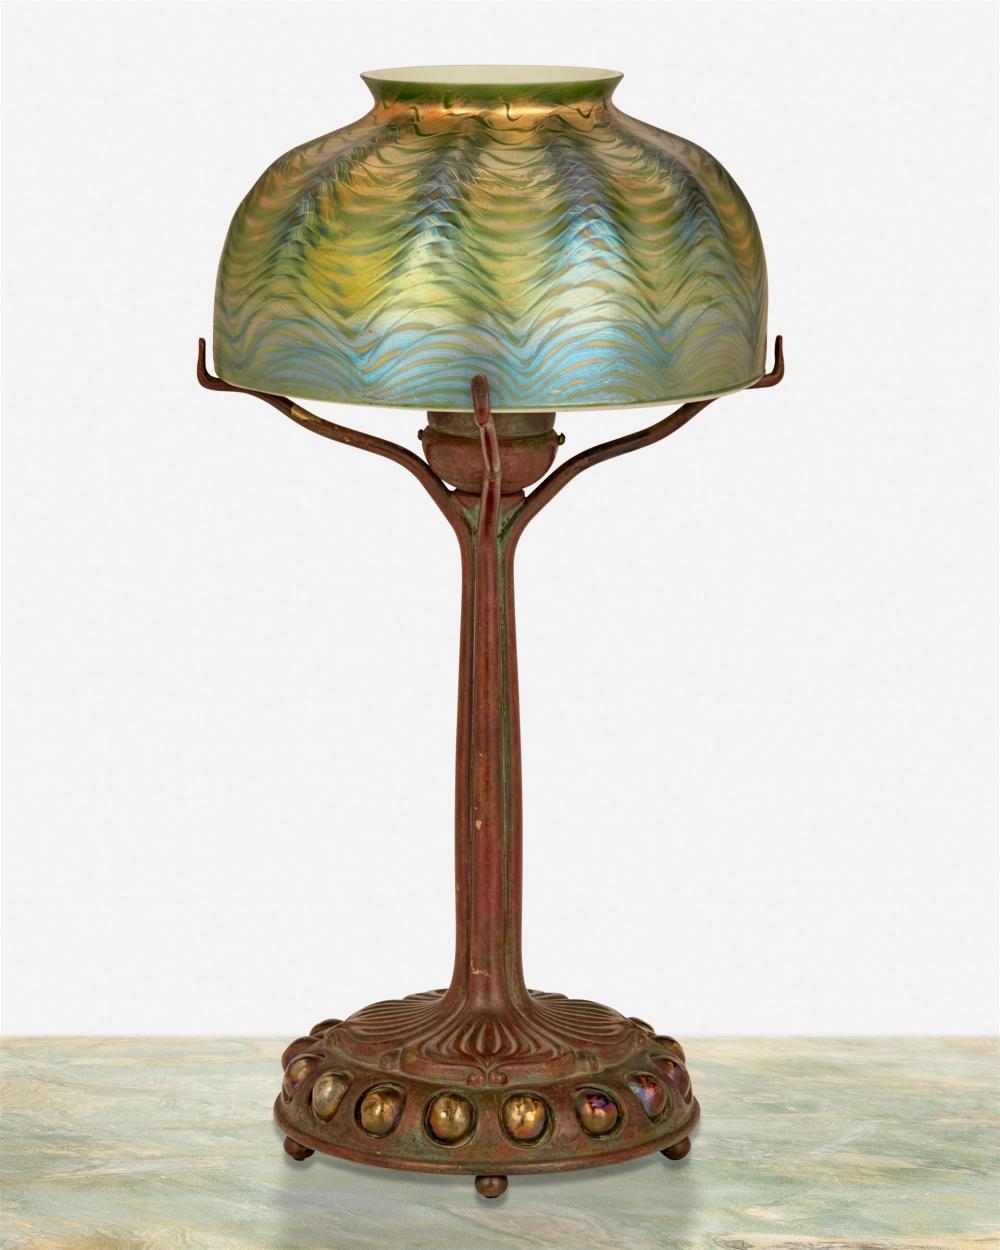 A Tiffany Studios bronze boudoir lamp with art glass shade